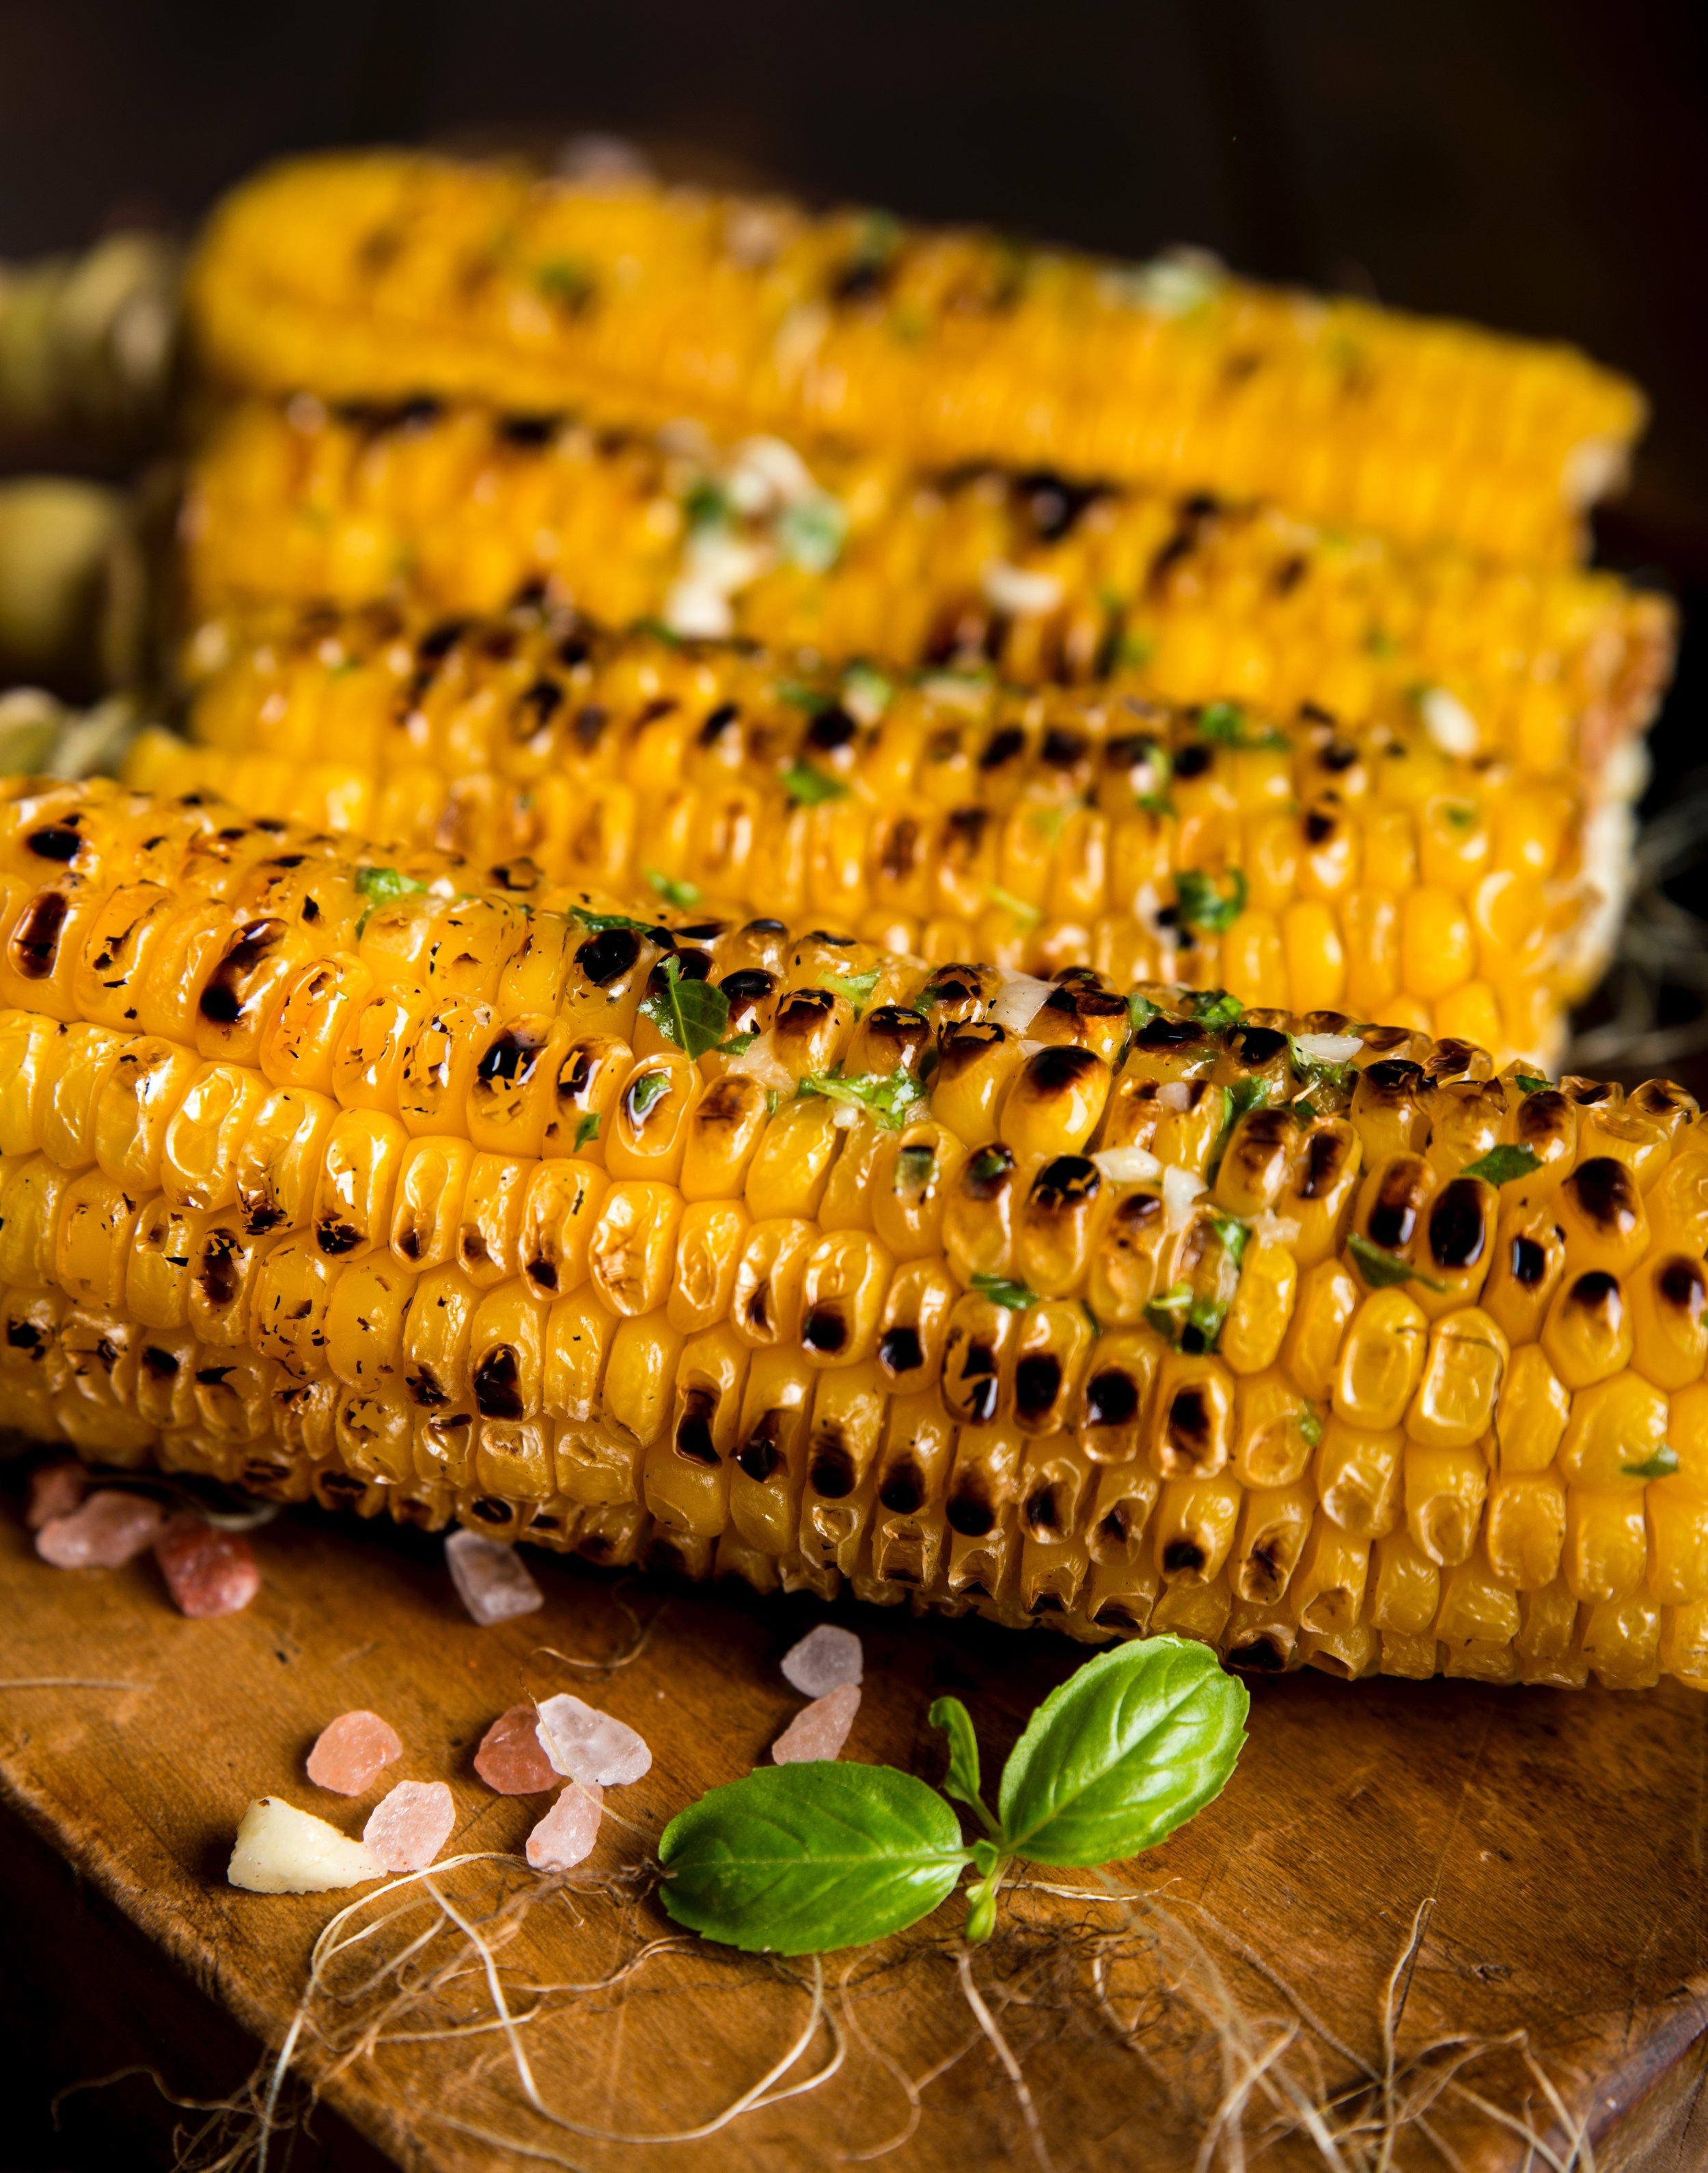 Grilled Corn Photo by  Dragne Marius  on  Unsplash